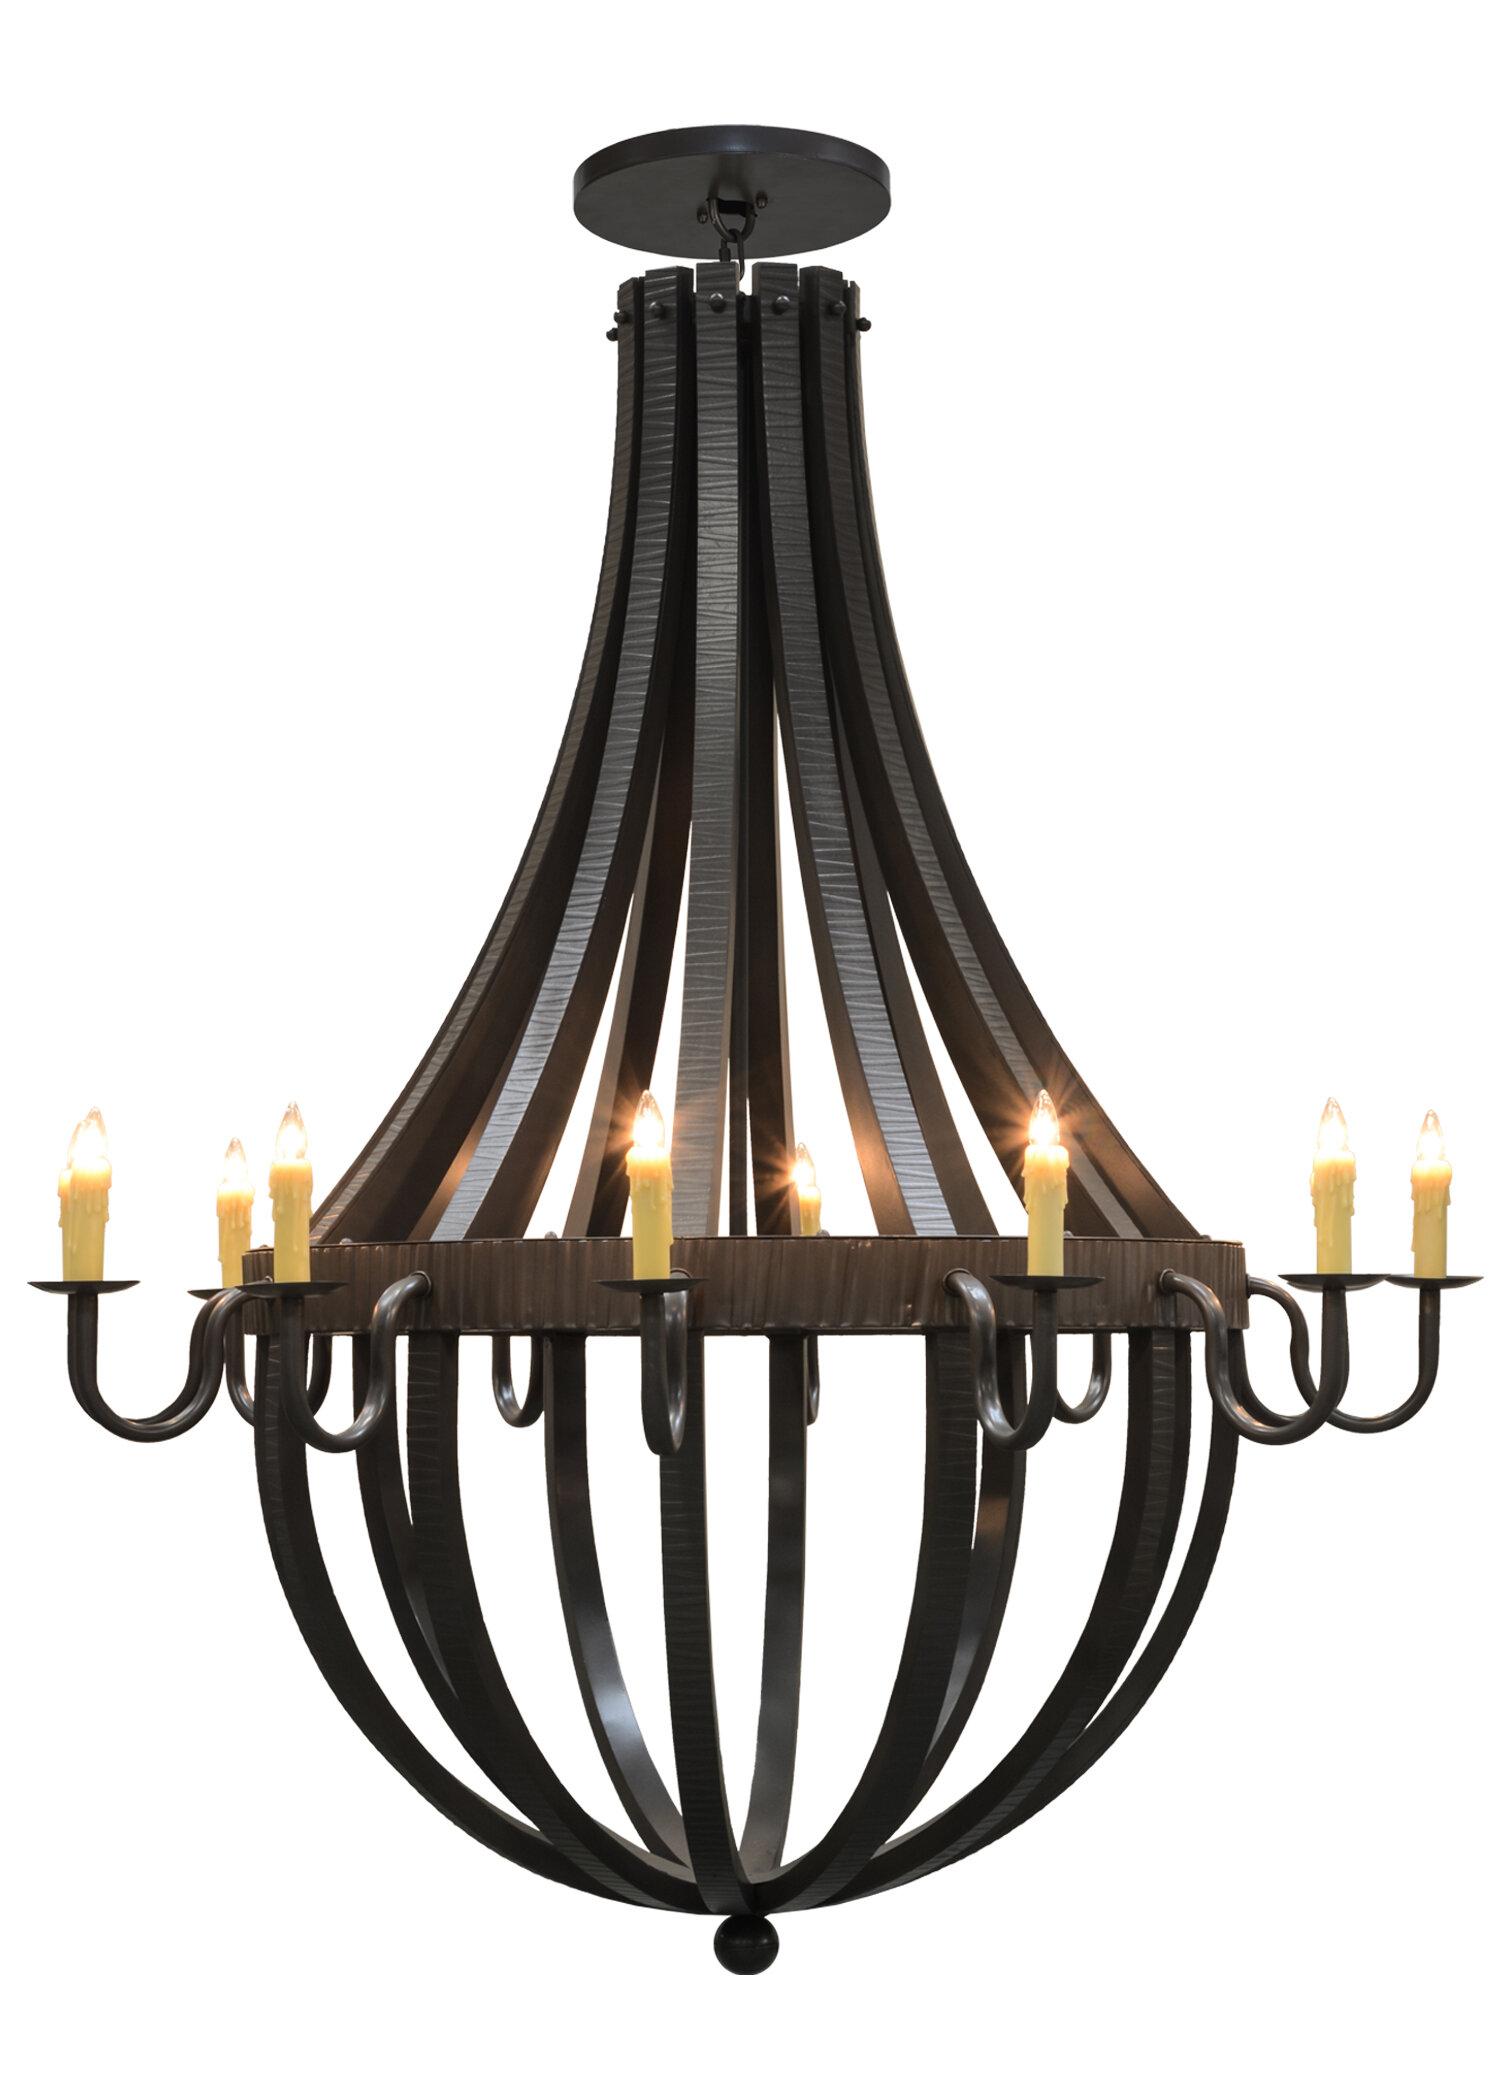 Meyda Tiffany 12 Light Candle Style Empire Chandelier Wayfair